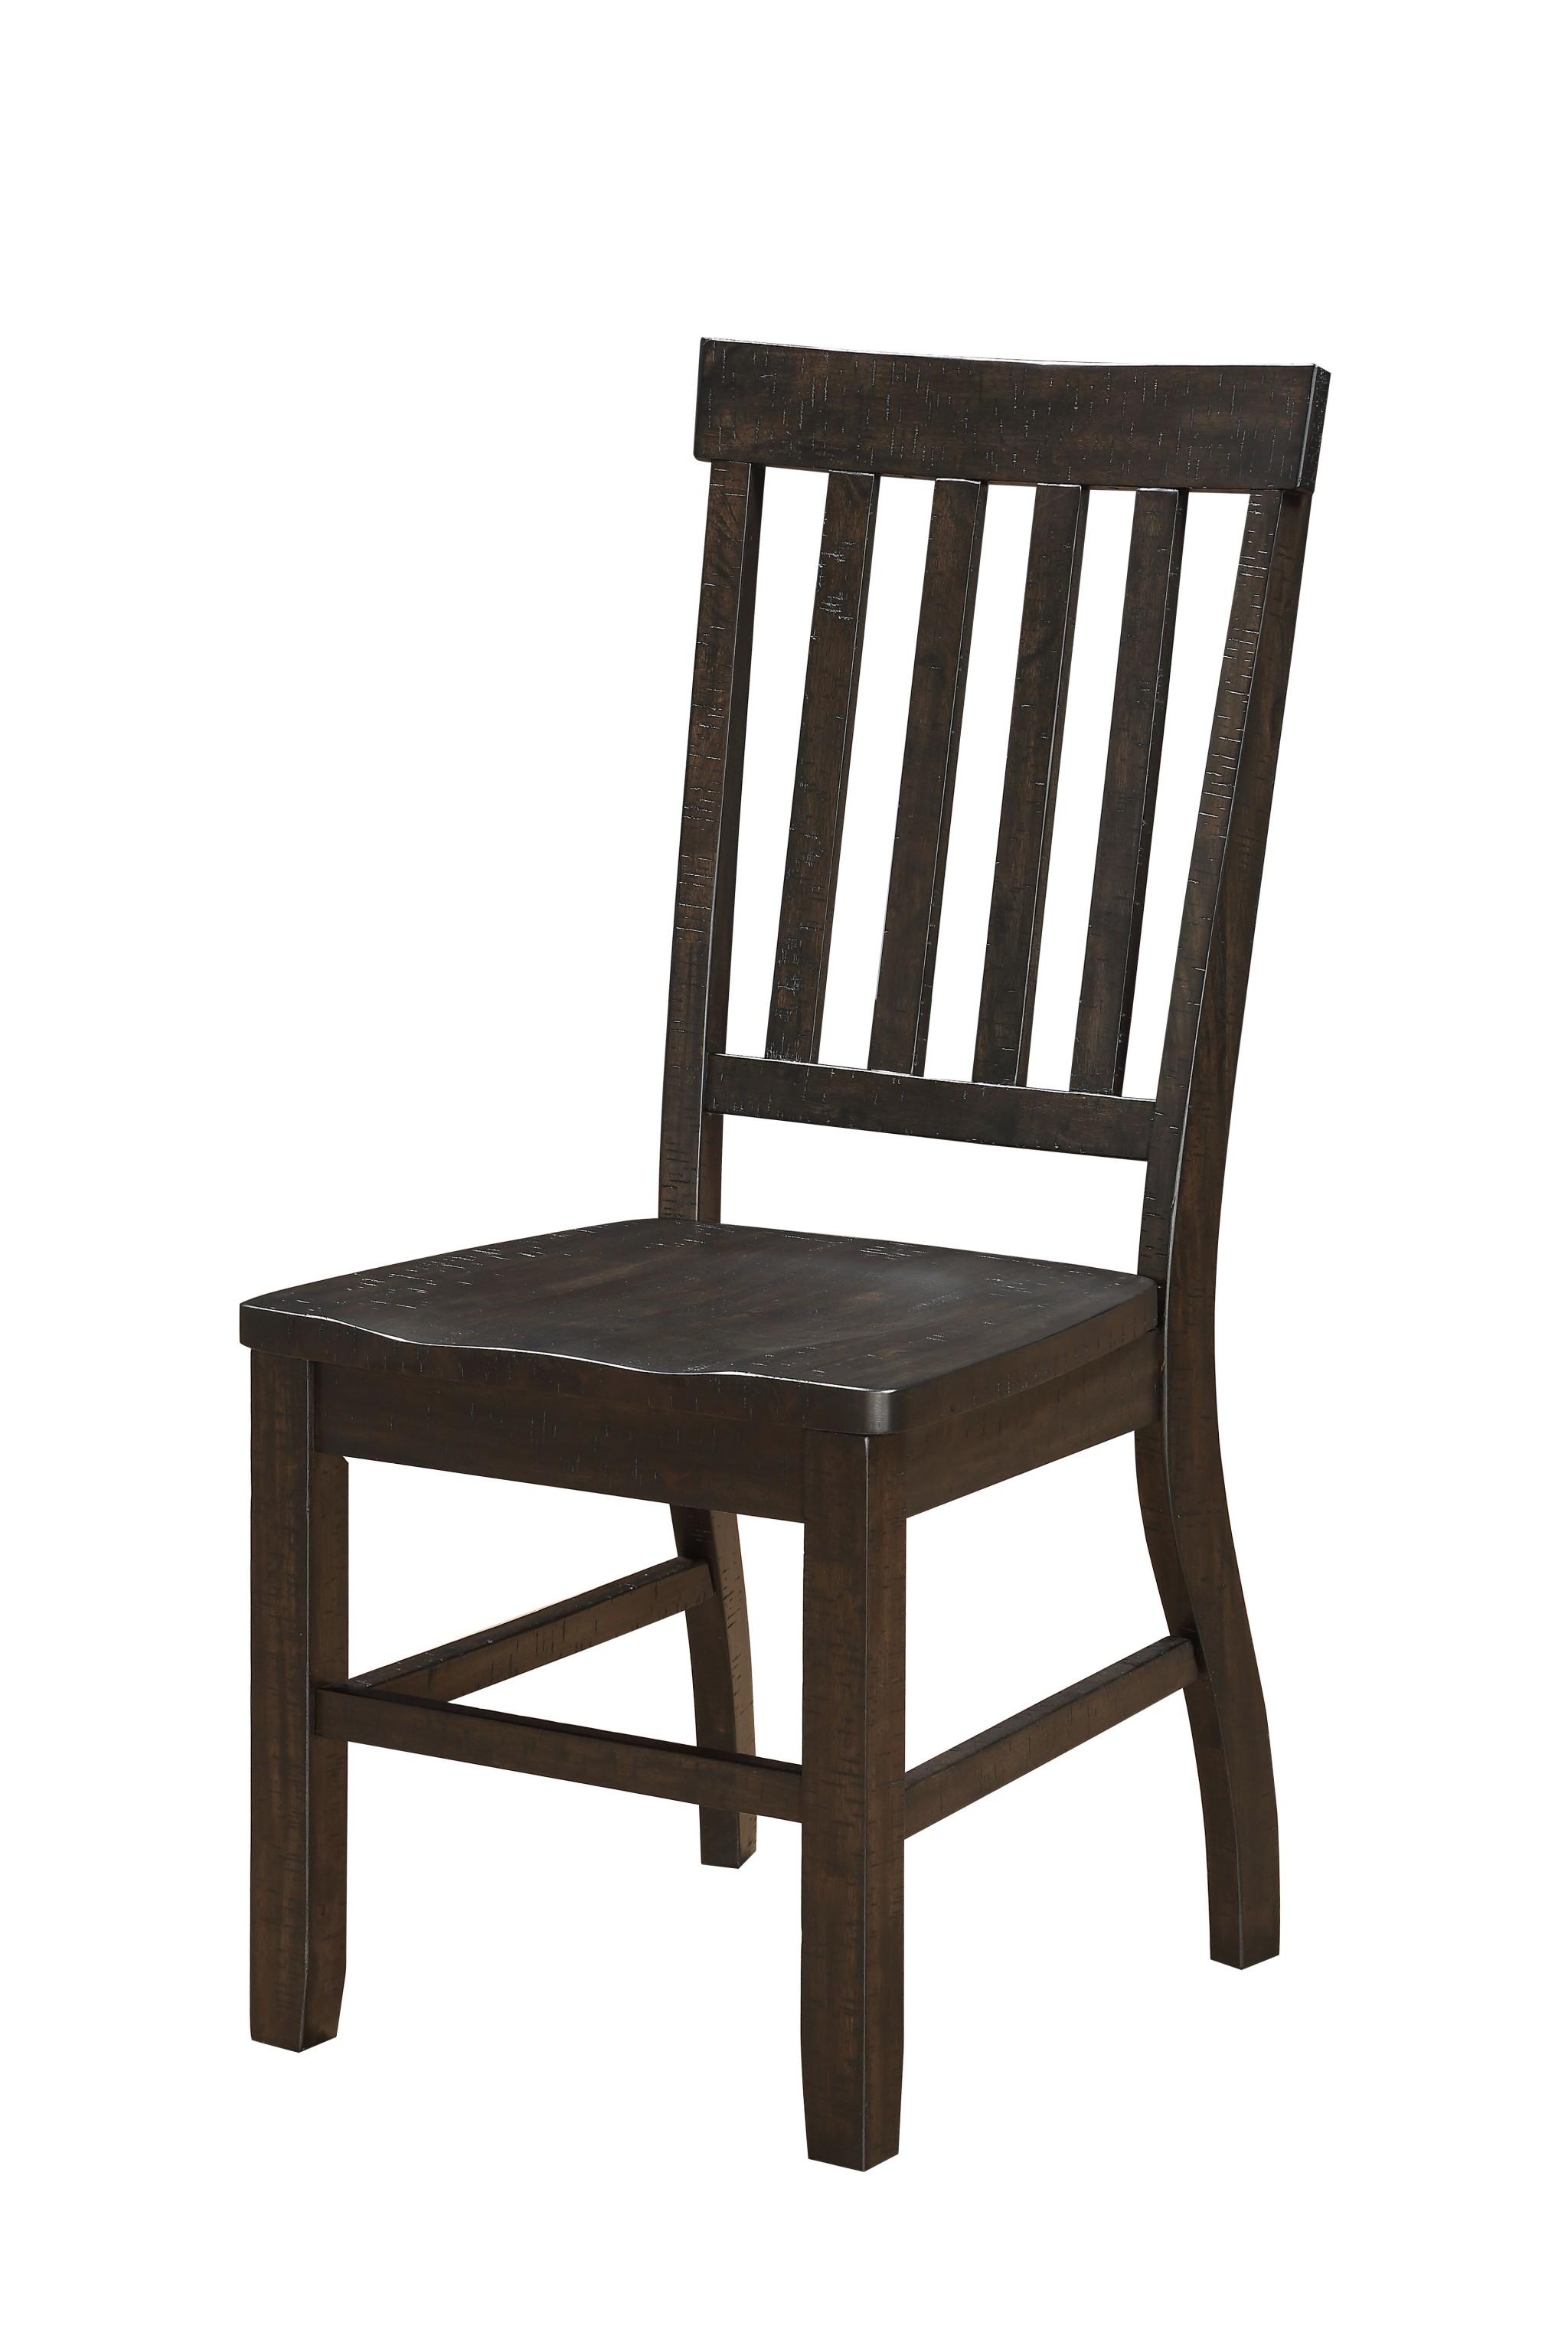 "22"" X 19"" X 40"" Rustic Walnut Wood Side Chair  Set of 2"